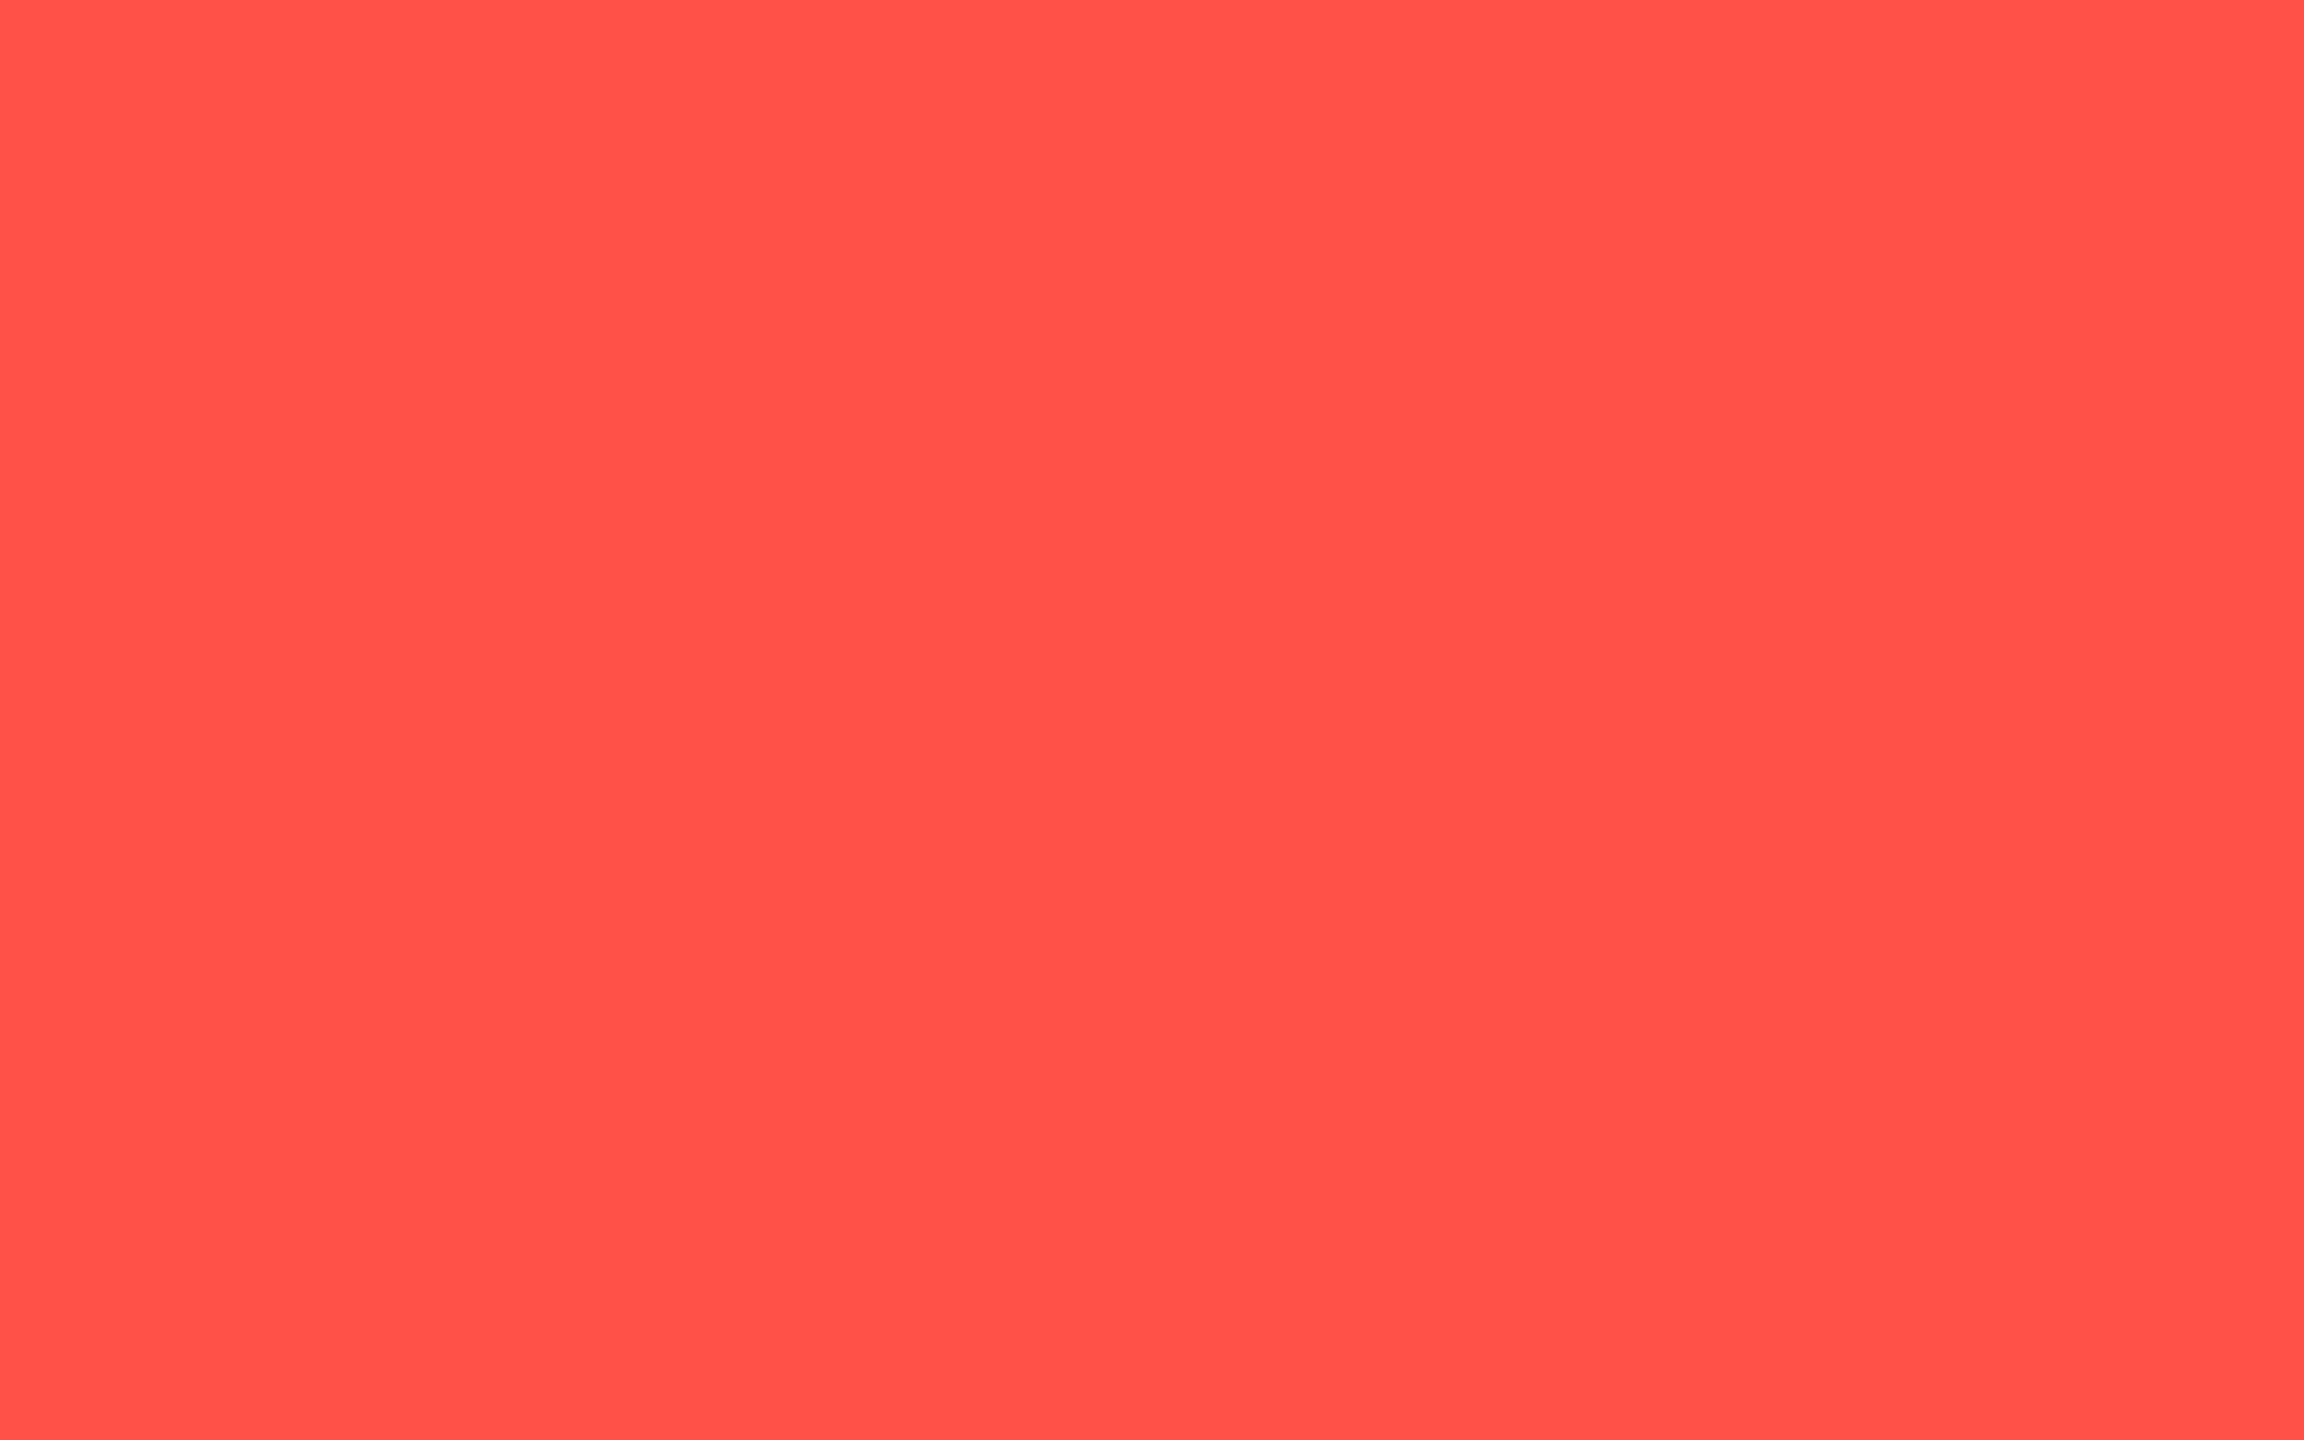 2304x1440 Red-orange Solid Color Background